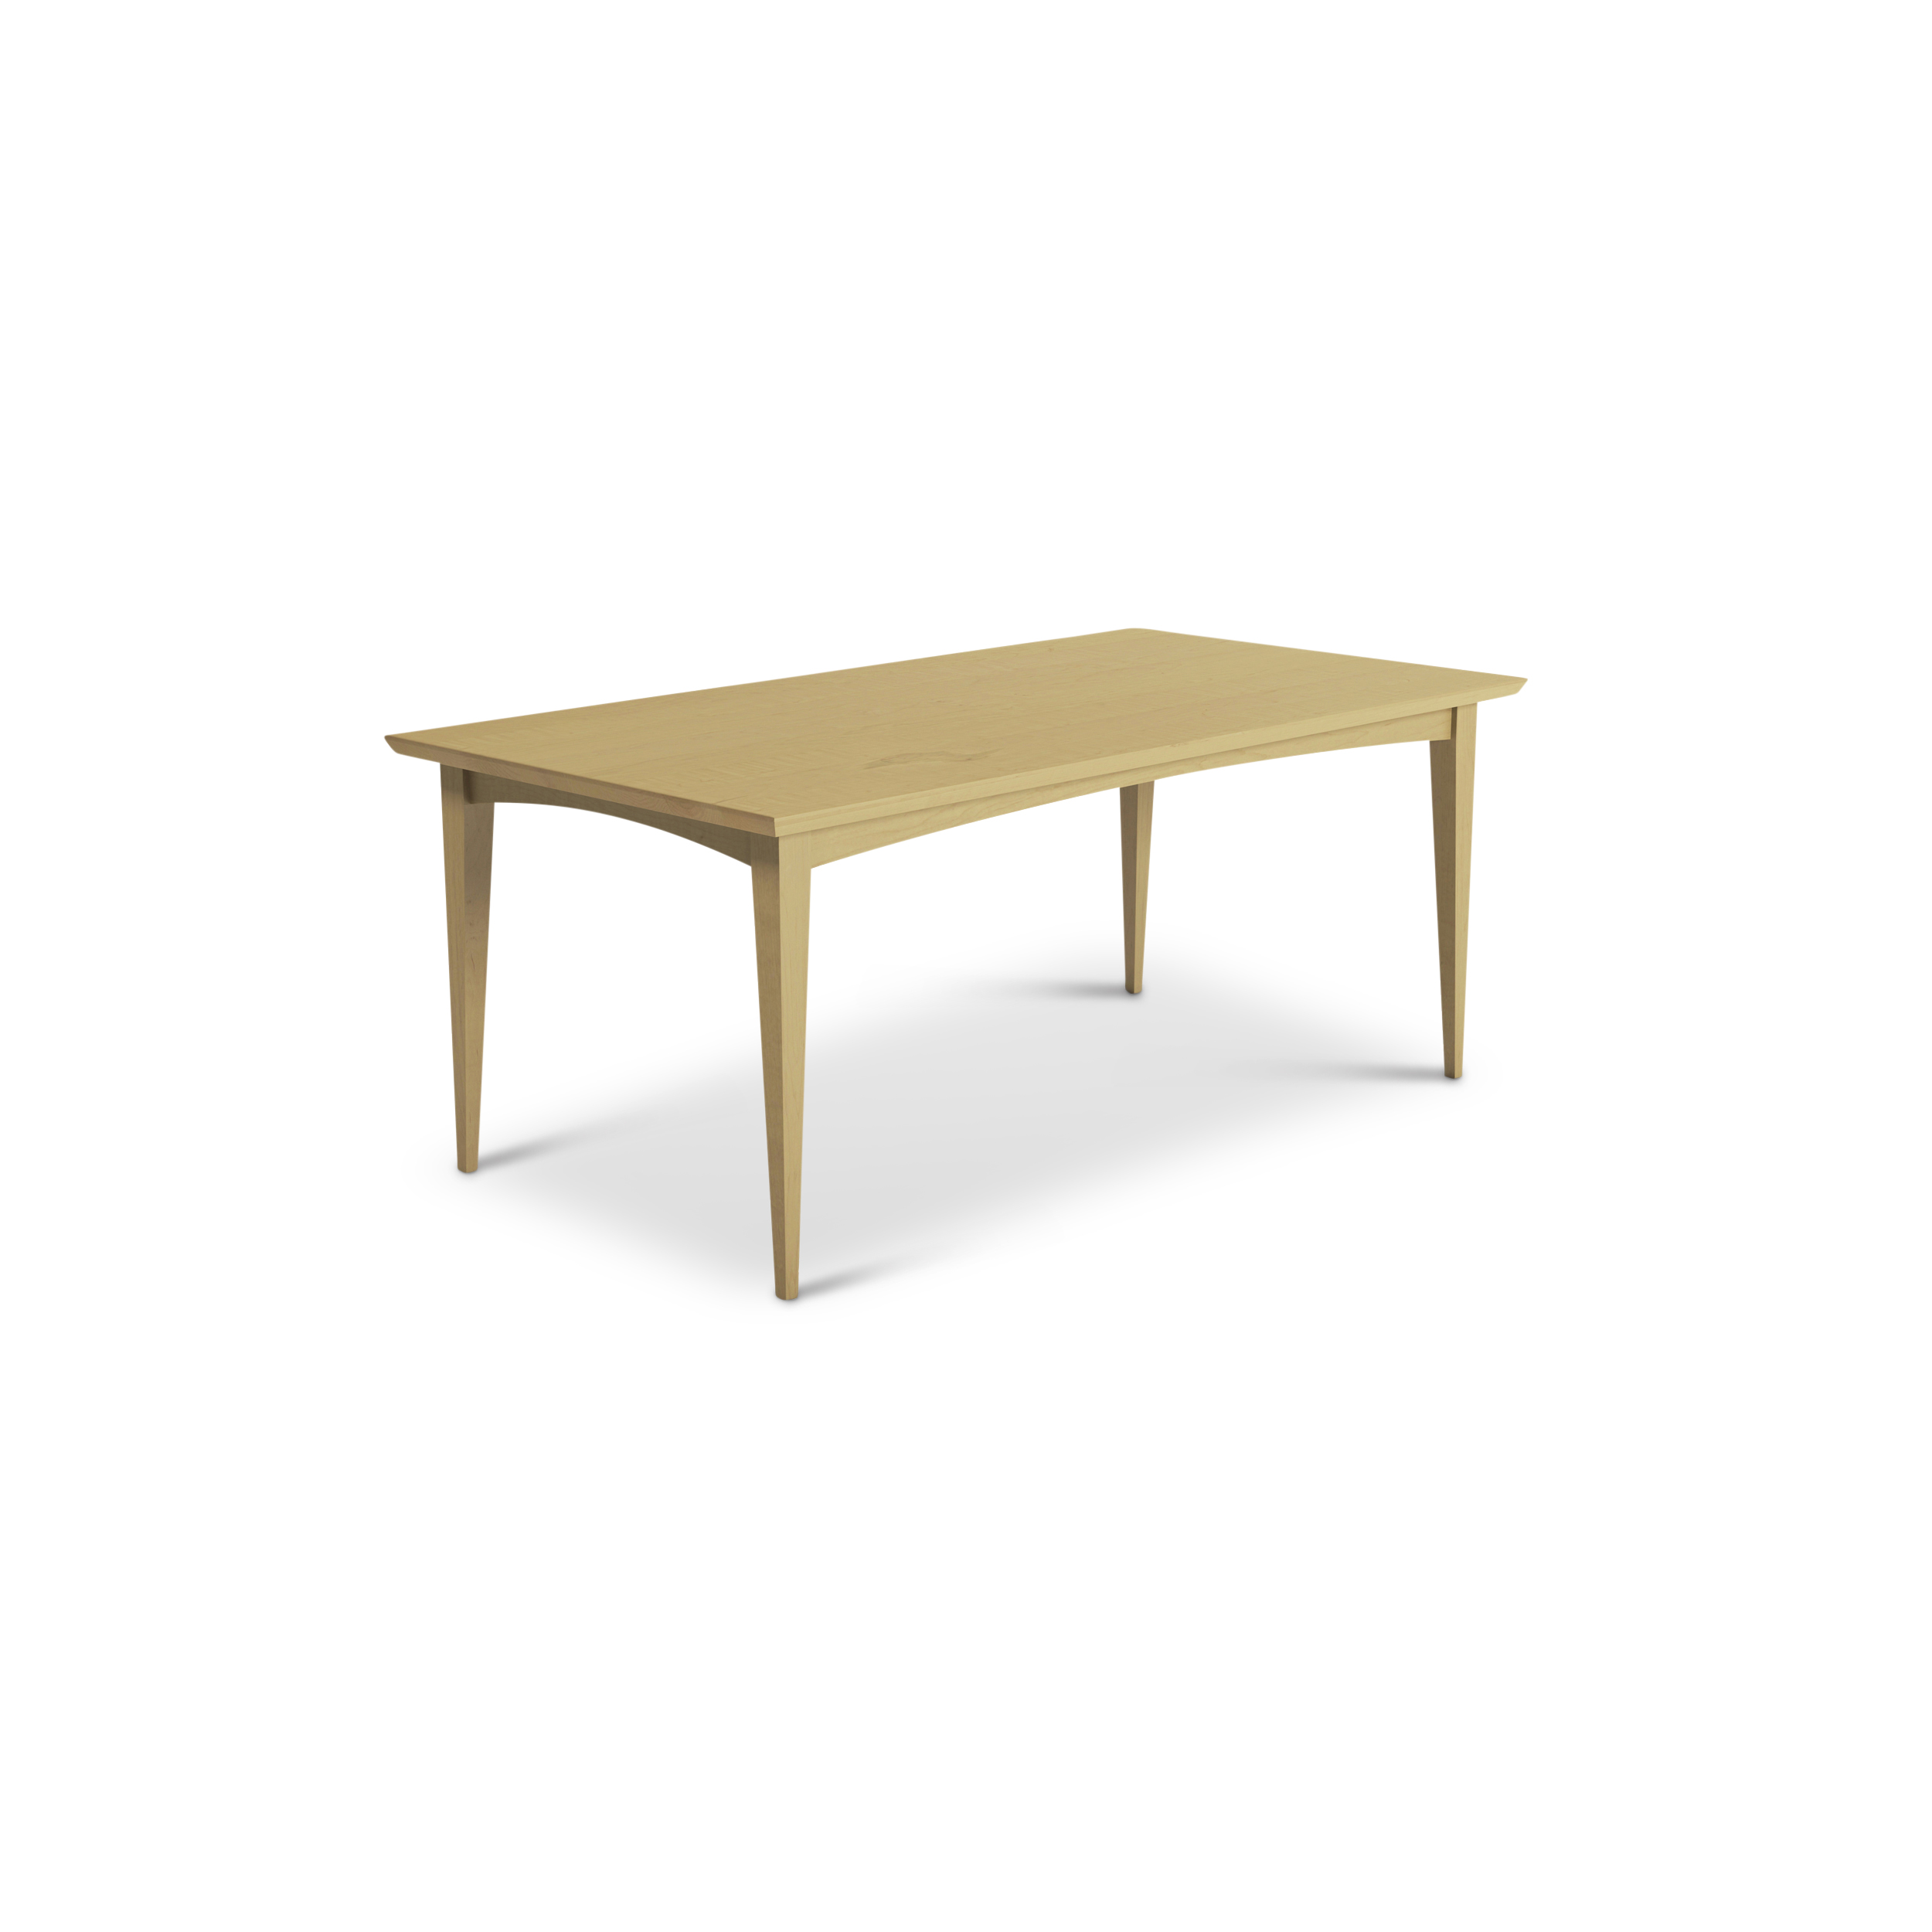 6 Foot Maple Mid-century Modern Dining Table